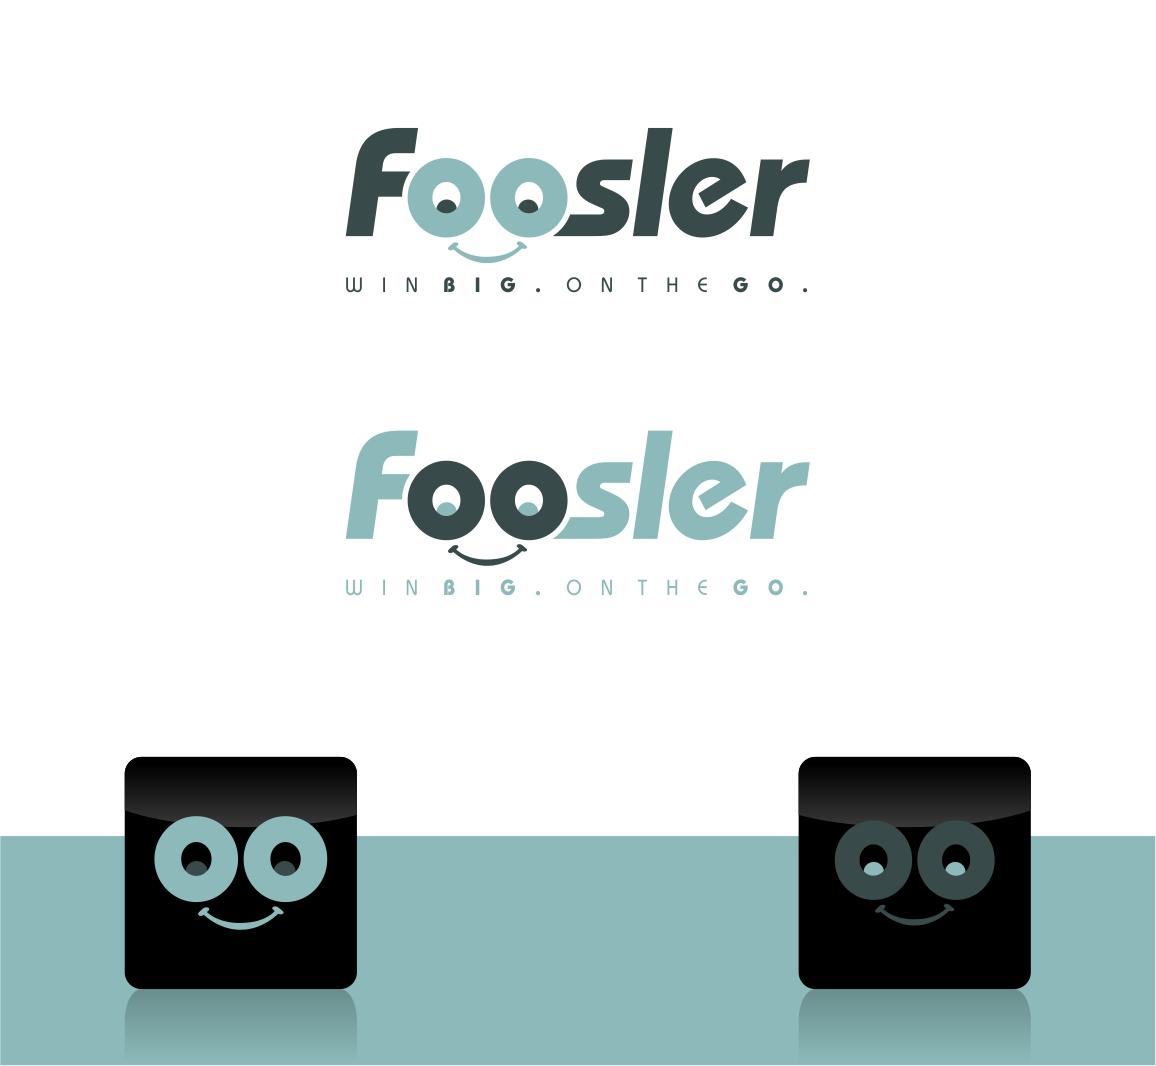 Logo Design by haidu - Entry No. 58 in the Logo Design Contest Foosler Logo Design.